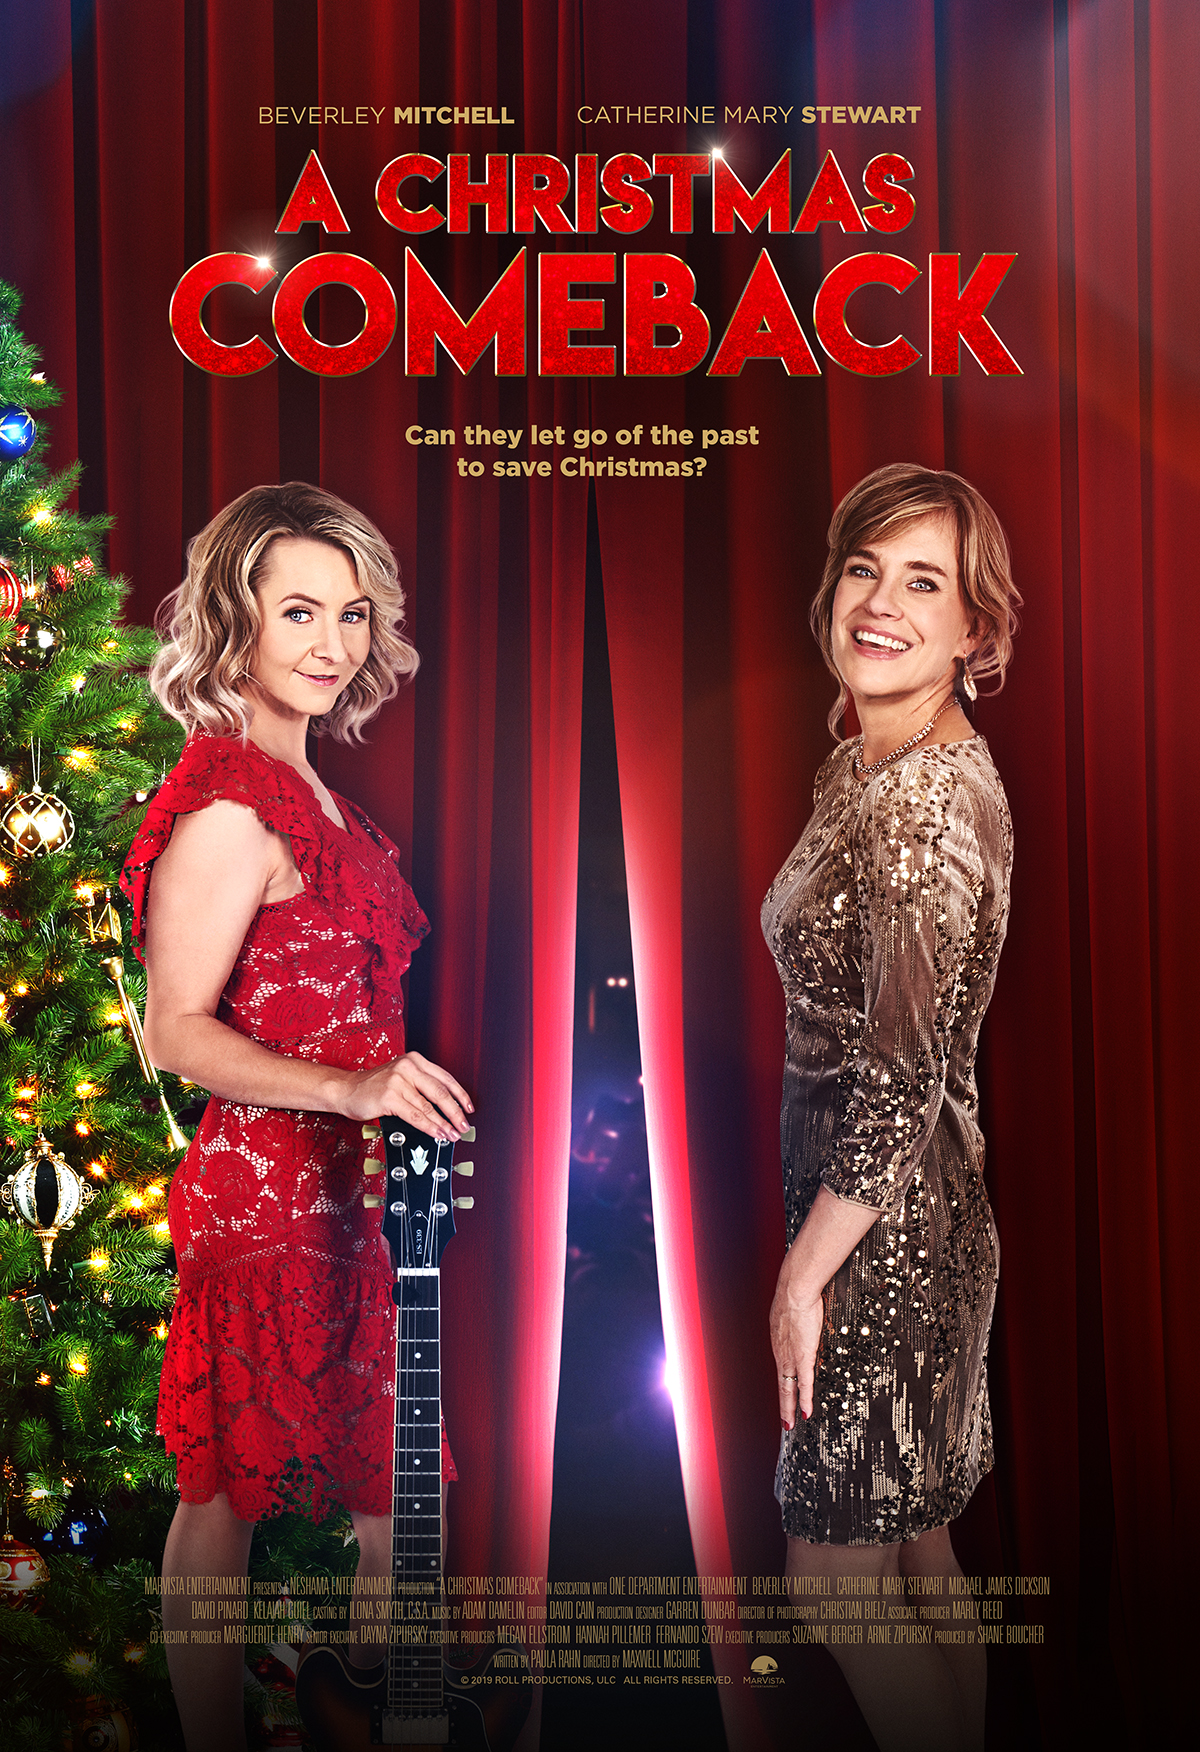 A Christmas Comeback